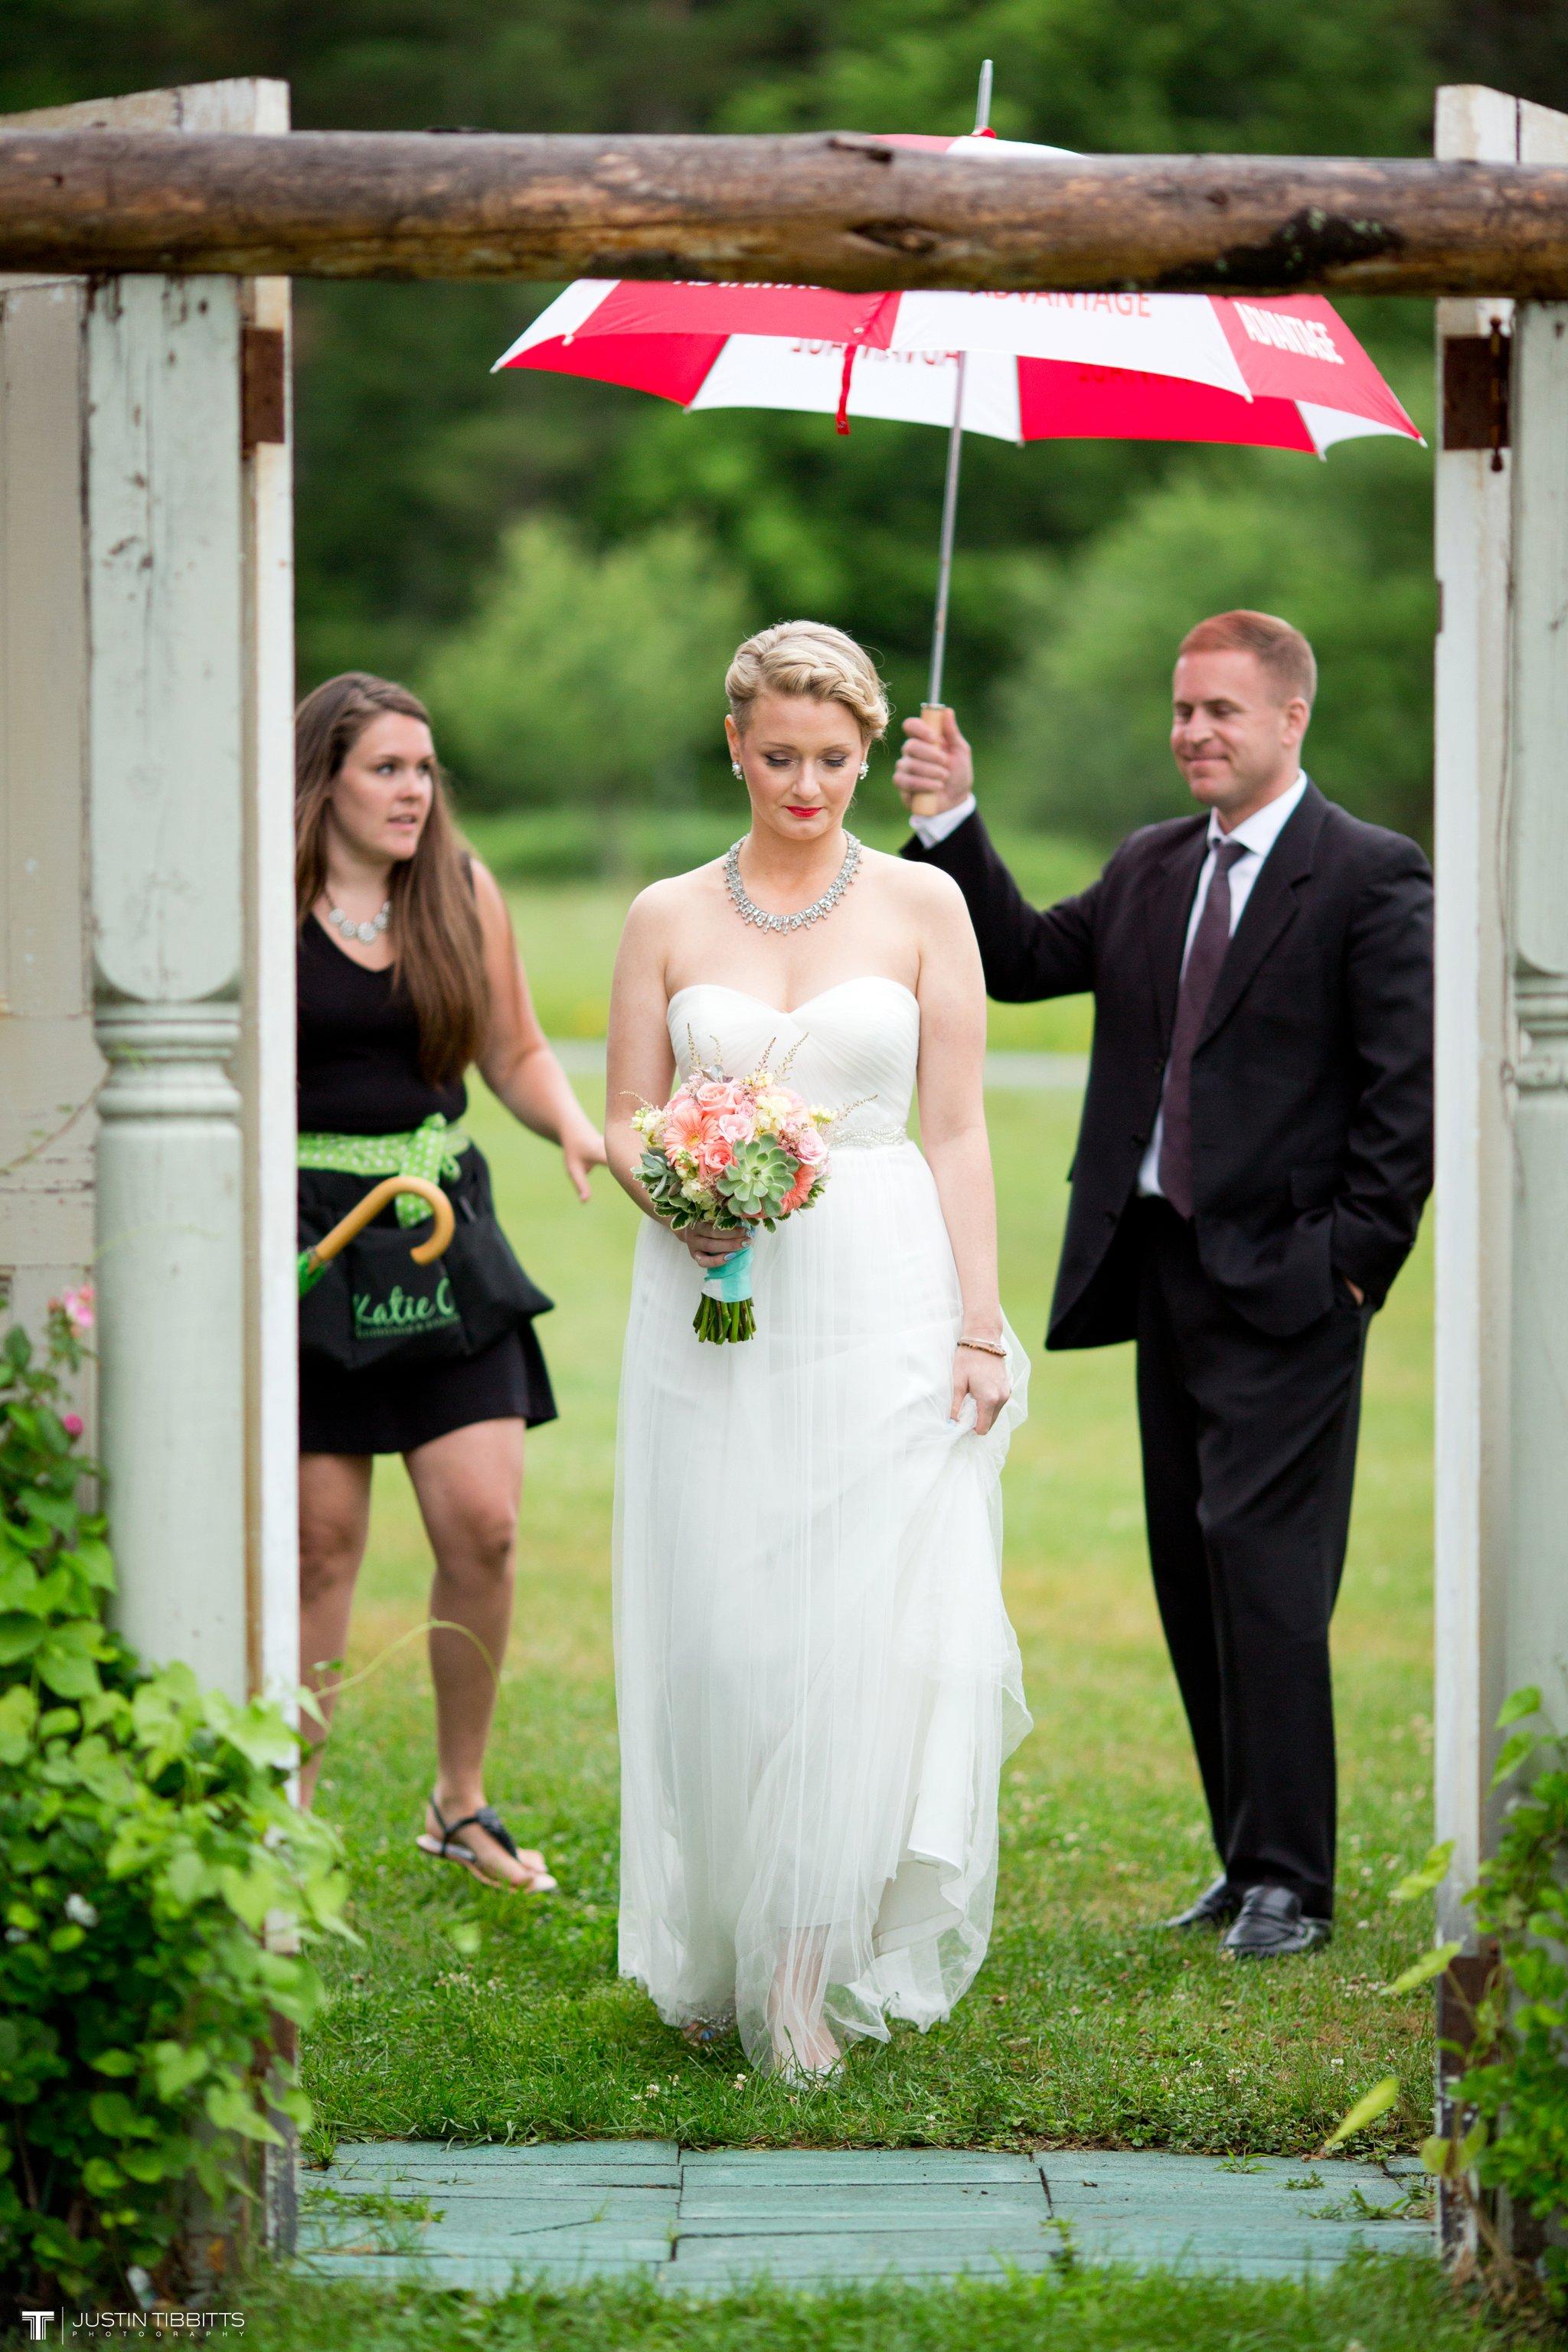 burlap-and-beams-wedding-photos-with-joran-and-molly_0052